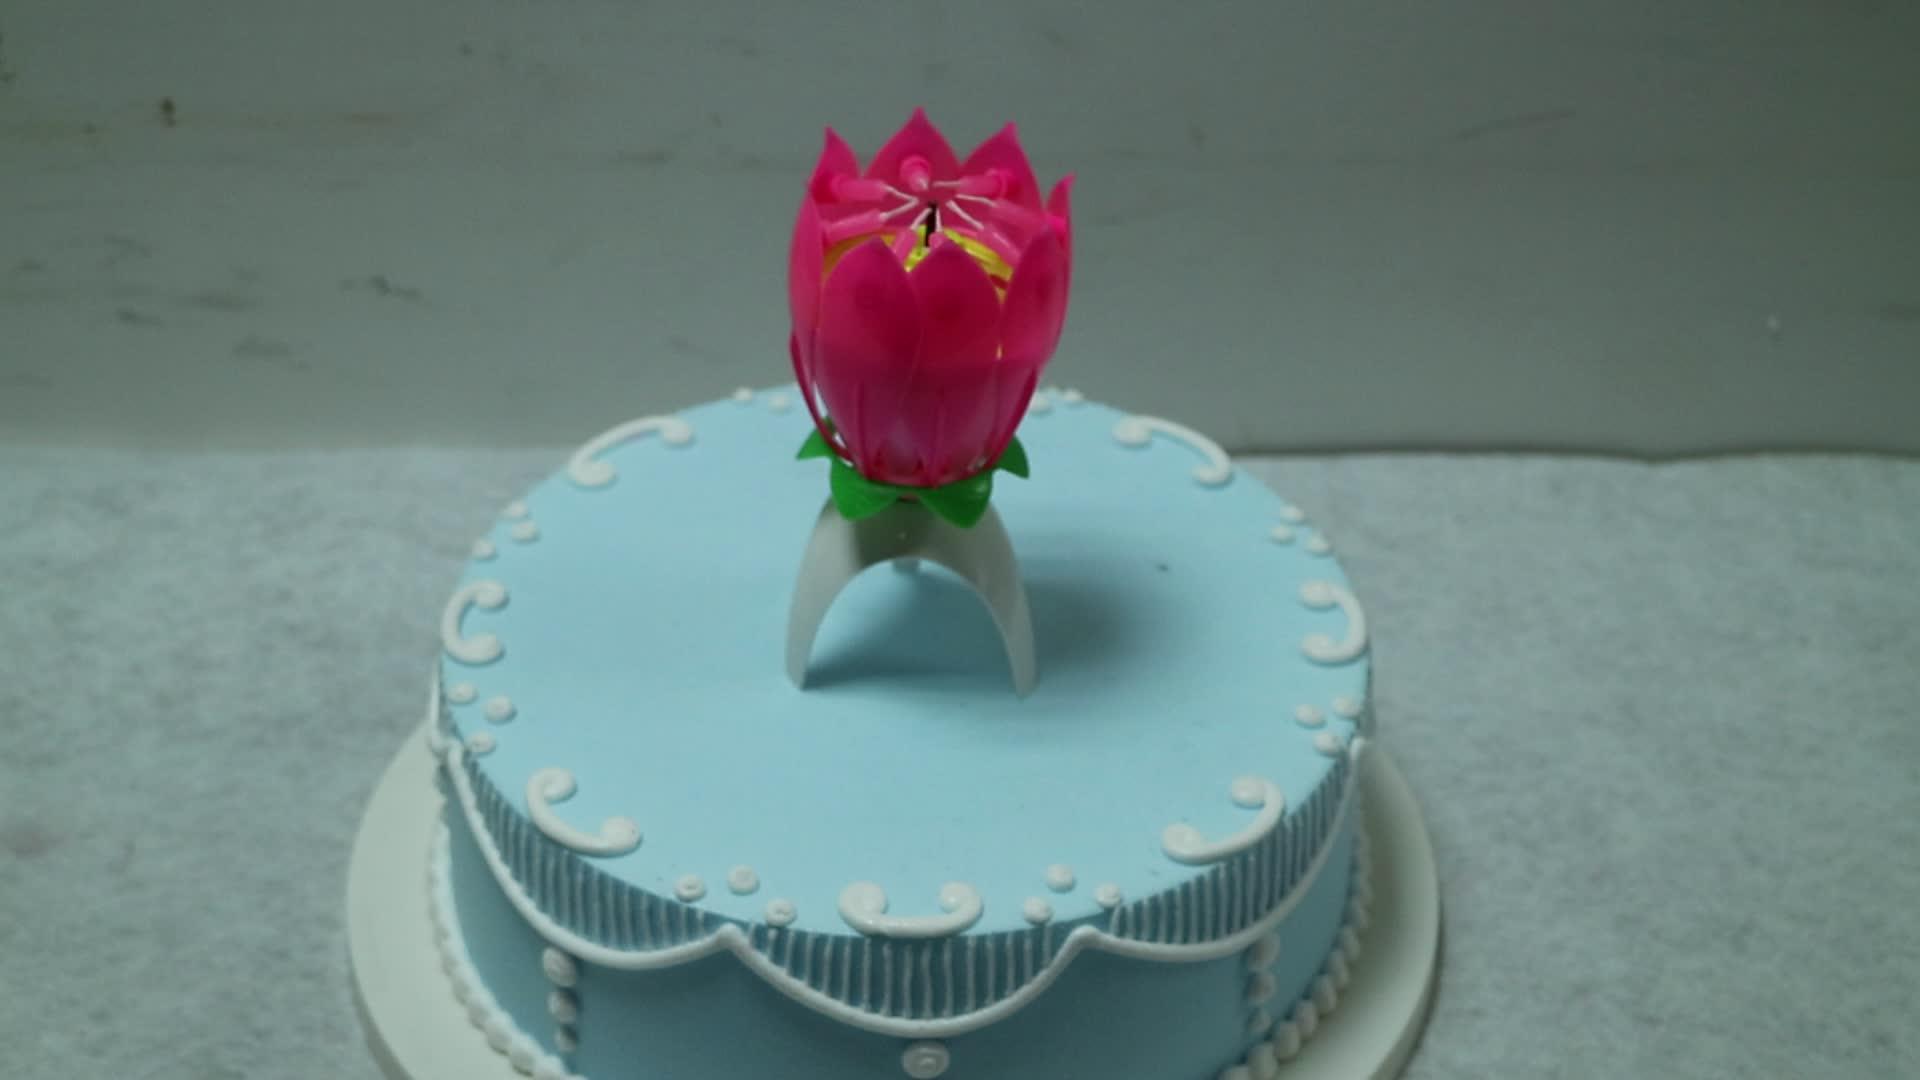 Lotus Flower Rotating Music Birthday Candle